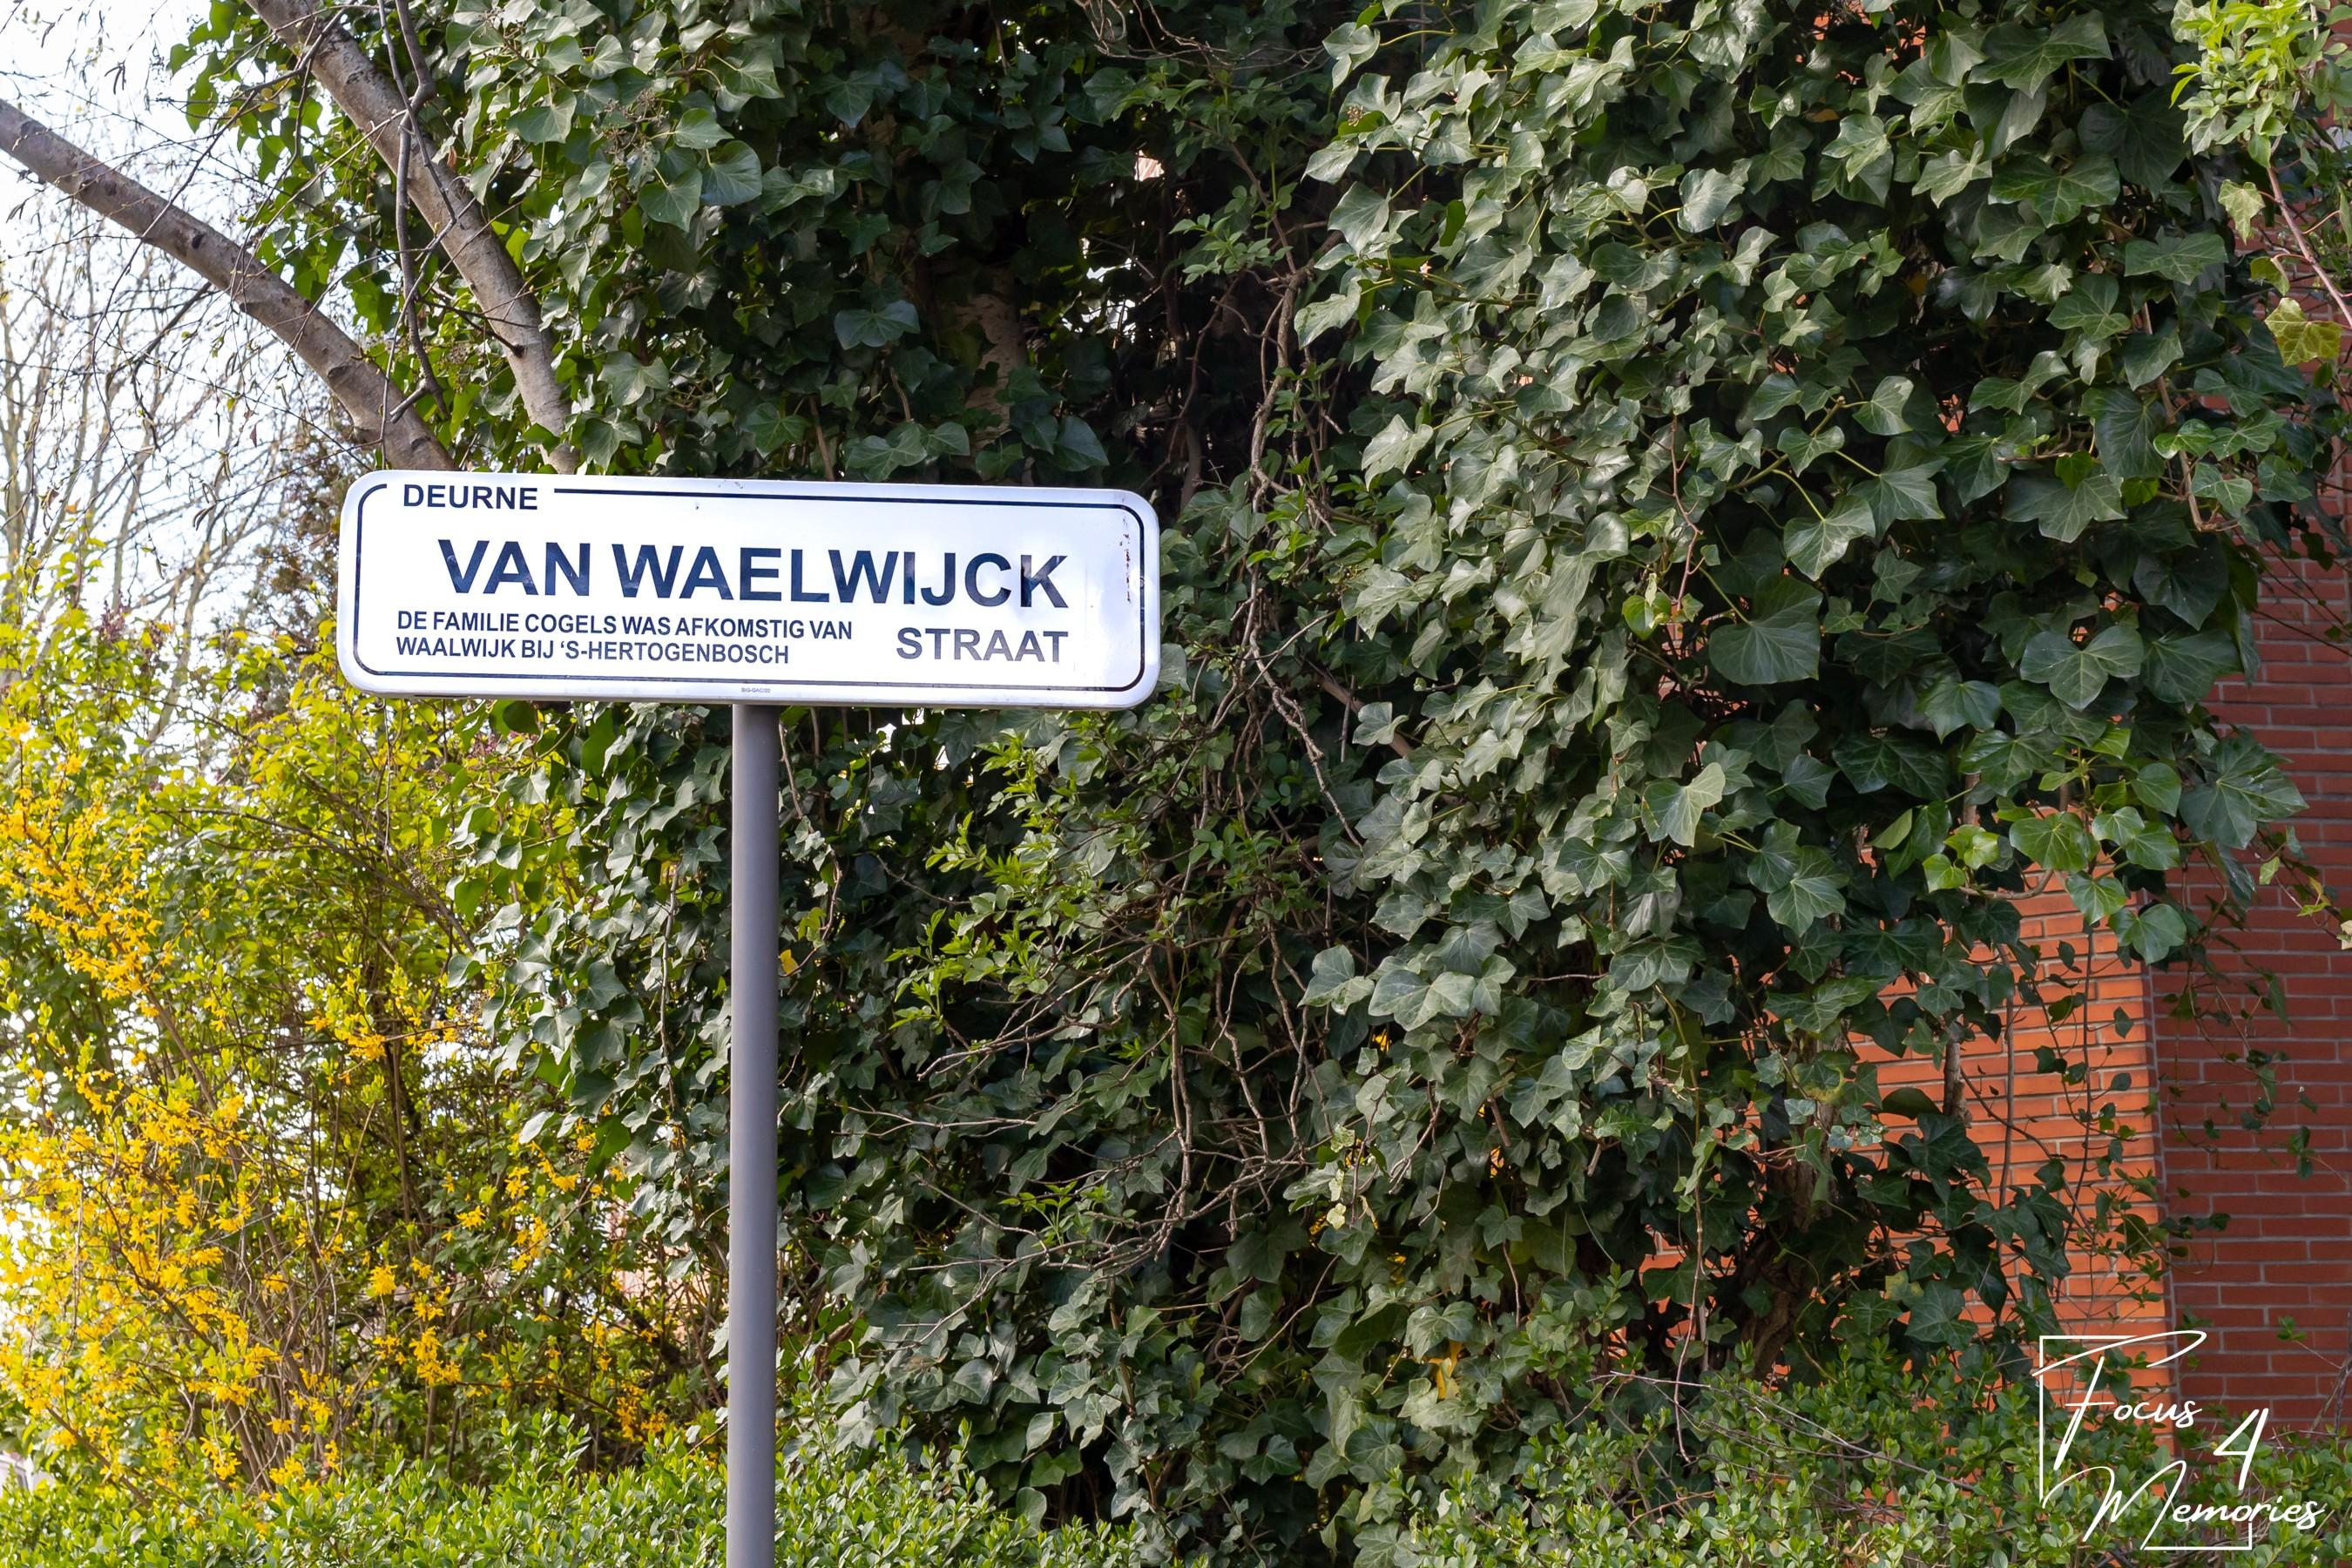 deurne leeft Van Waelwijckstraat